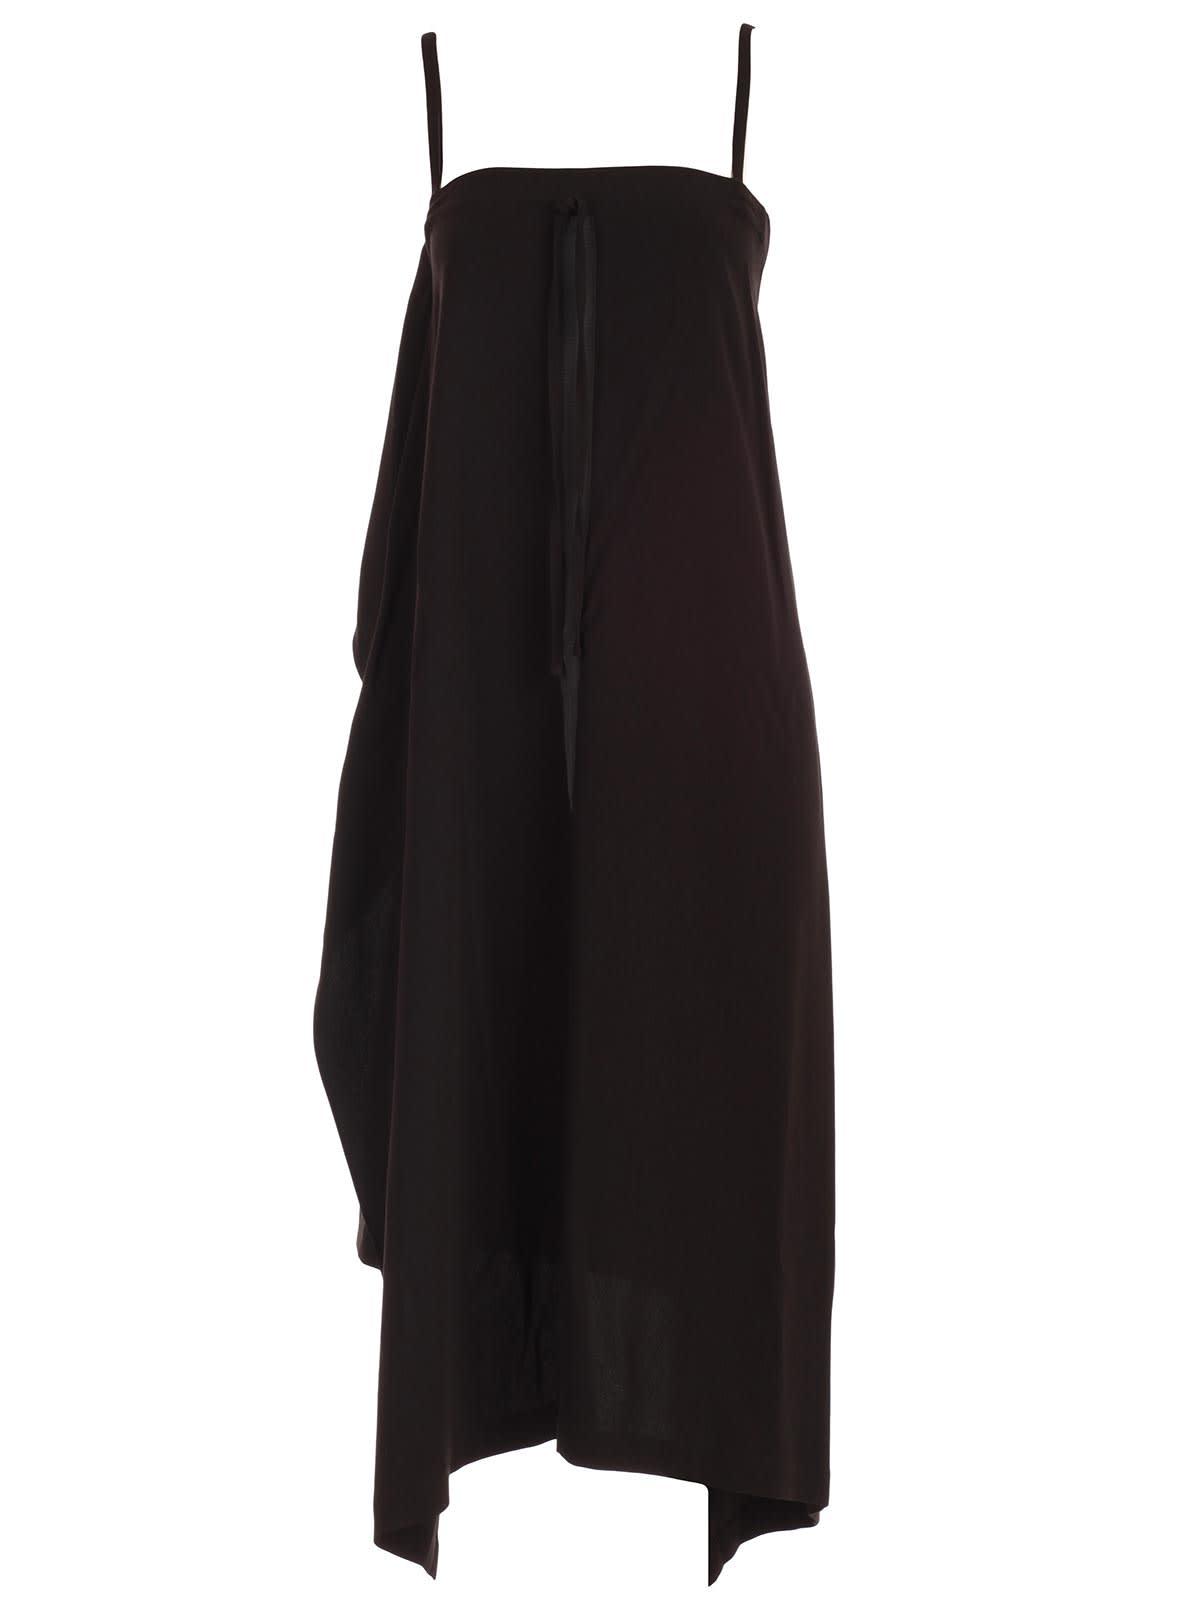 McQ Alexander McQueen Dress Thin Strap